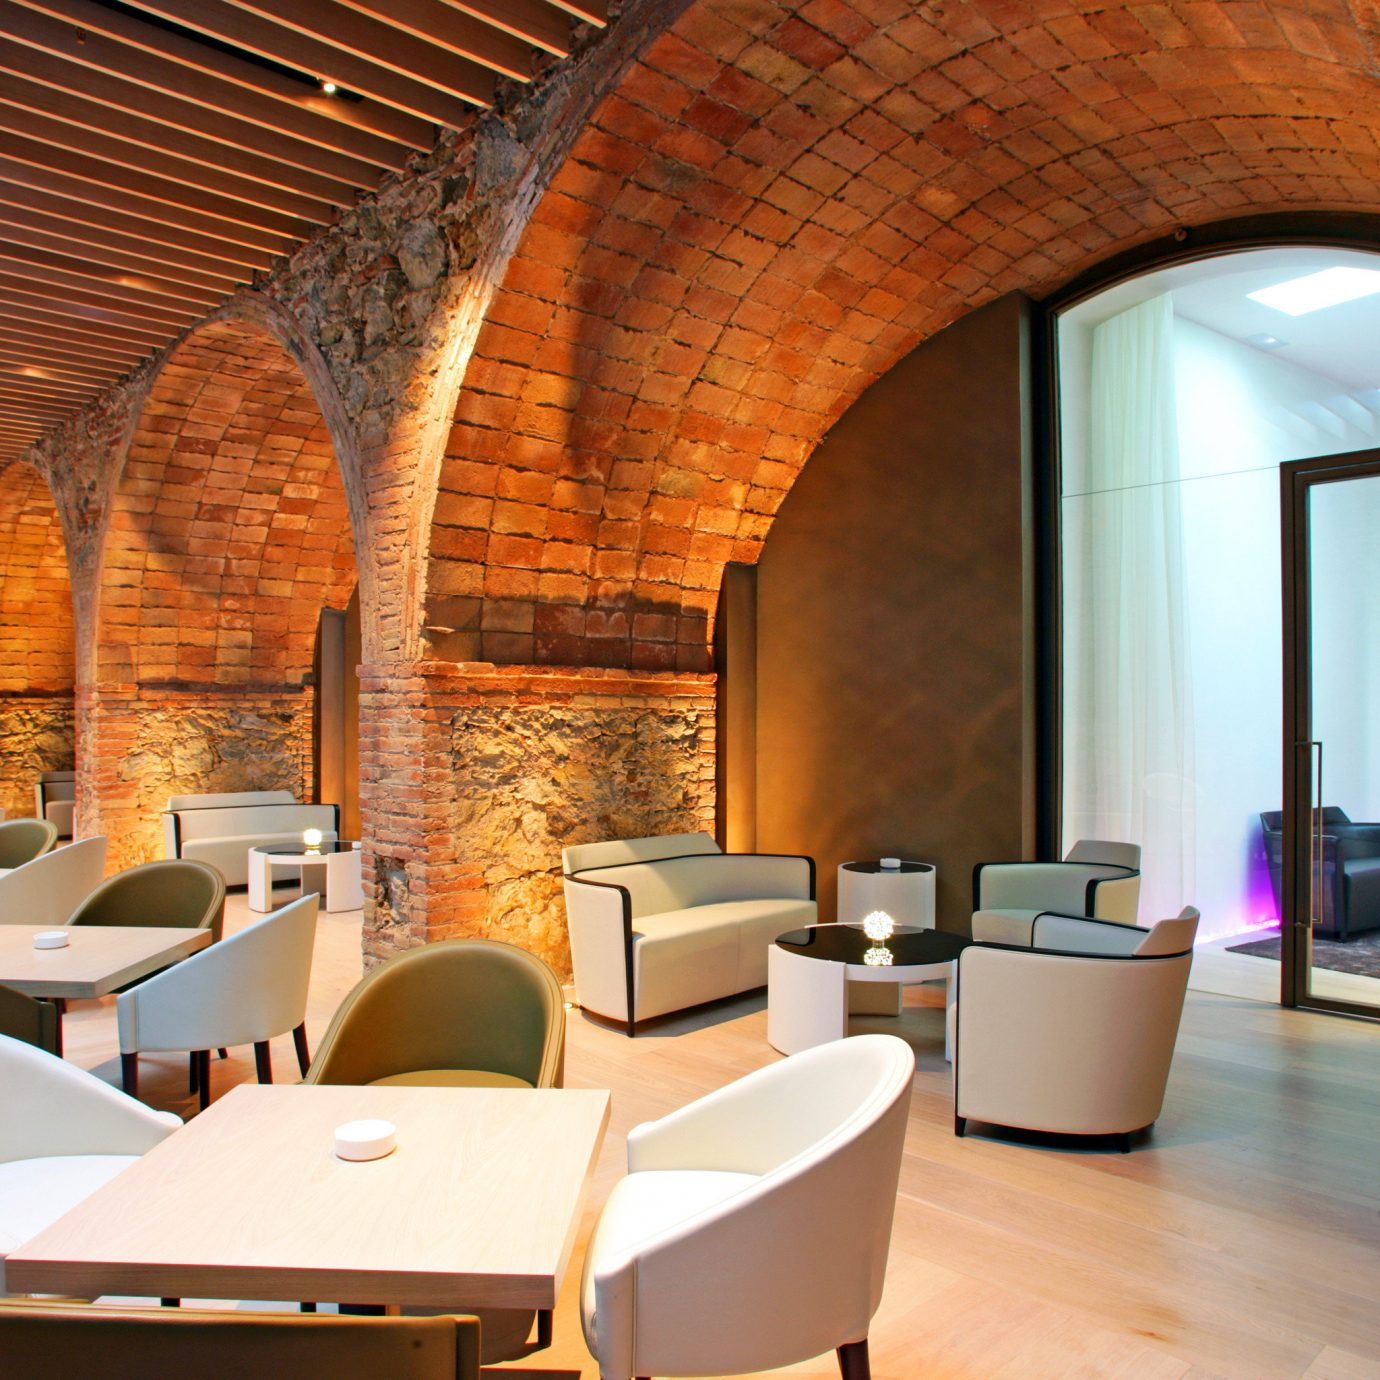 Bar Barcelona Dining Drink Eat Hotels Lounge Modern Spain chair building Architecture Lobby home Suite living room Resort Villa restaurant hacienda